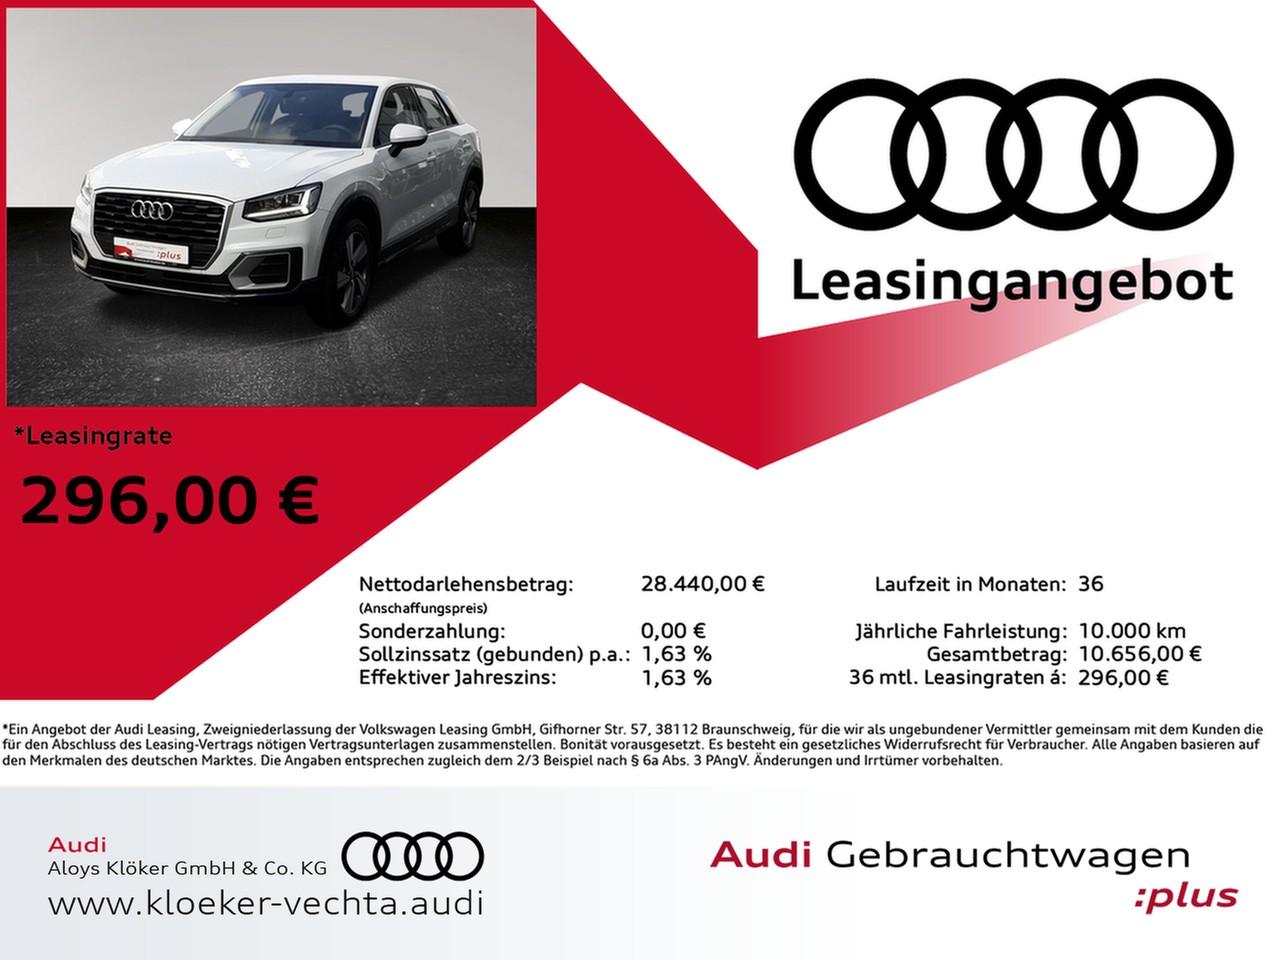 Audi Q2 finanzieren